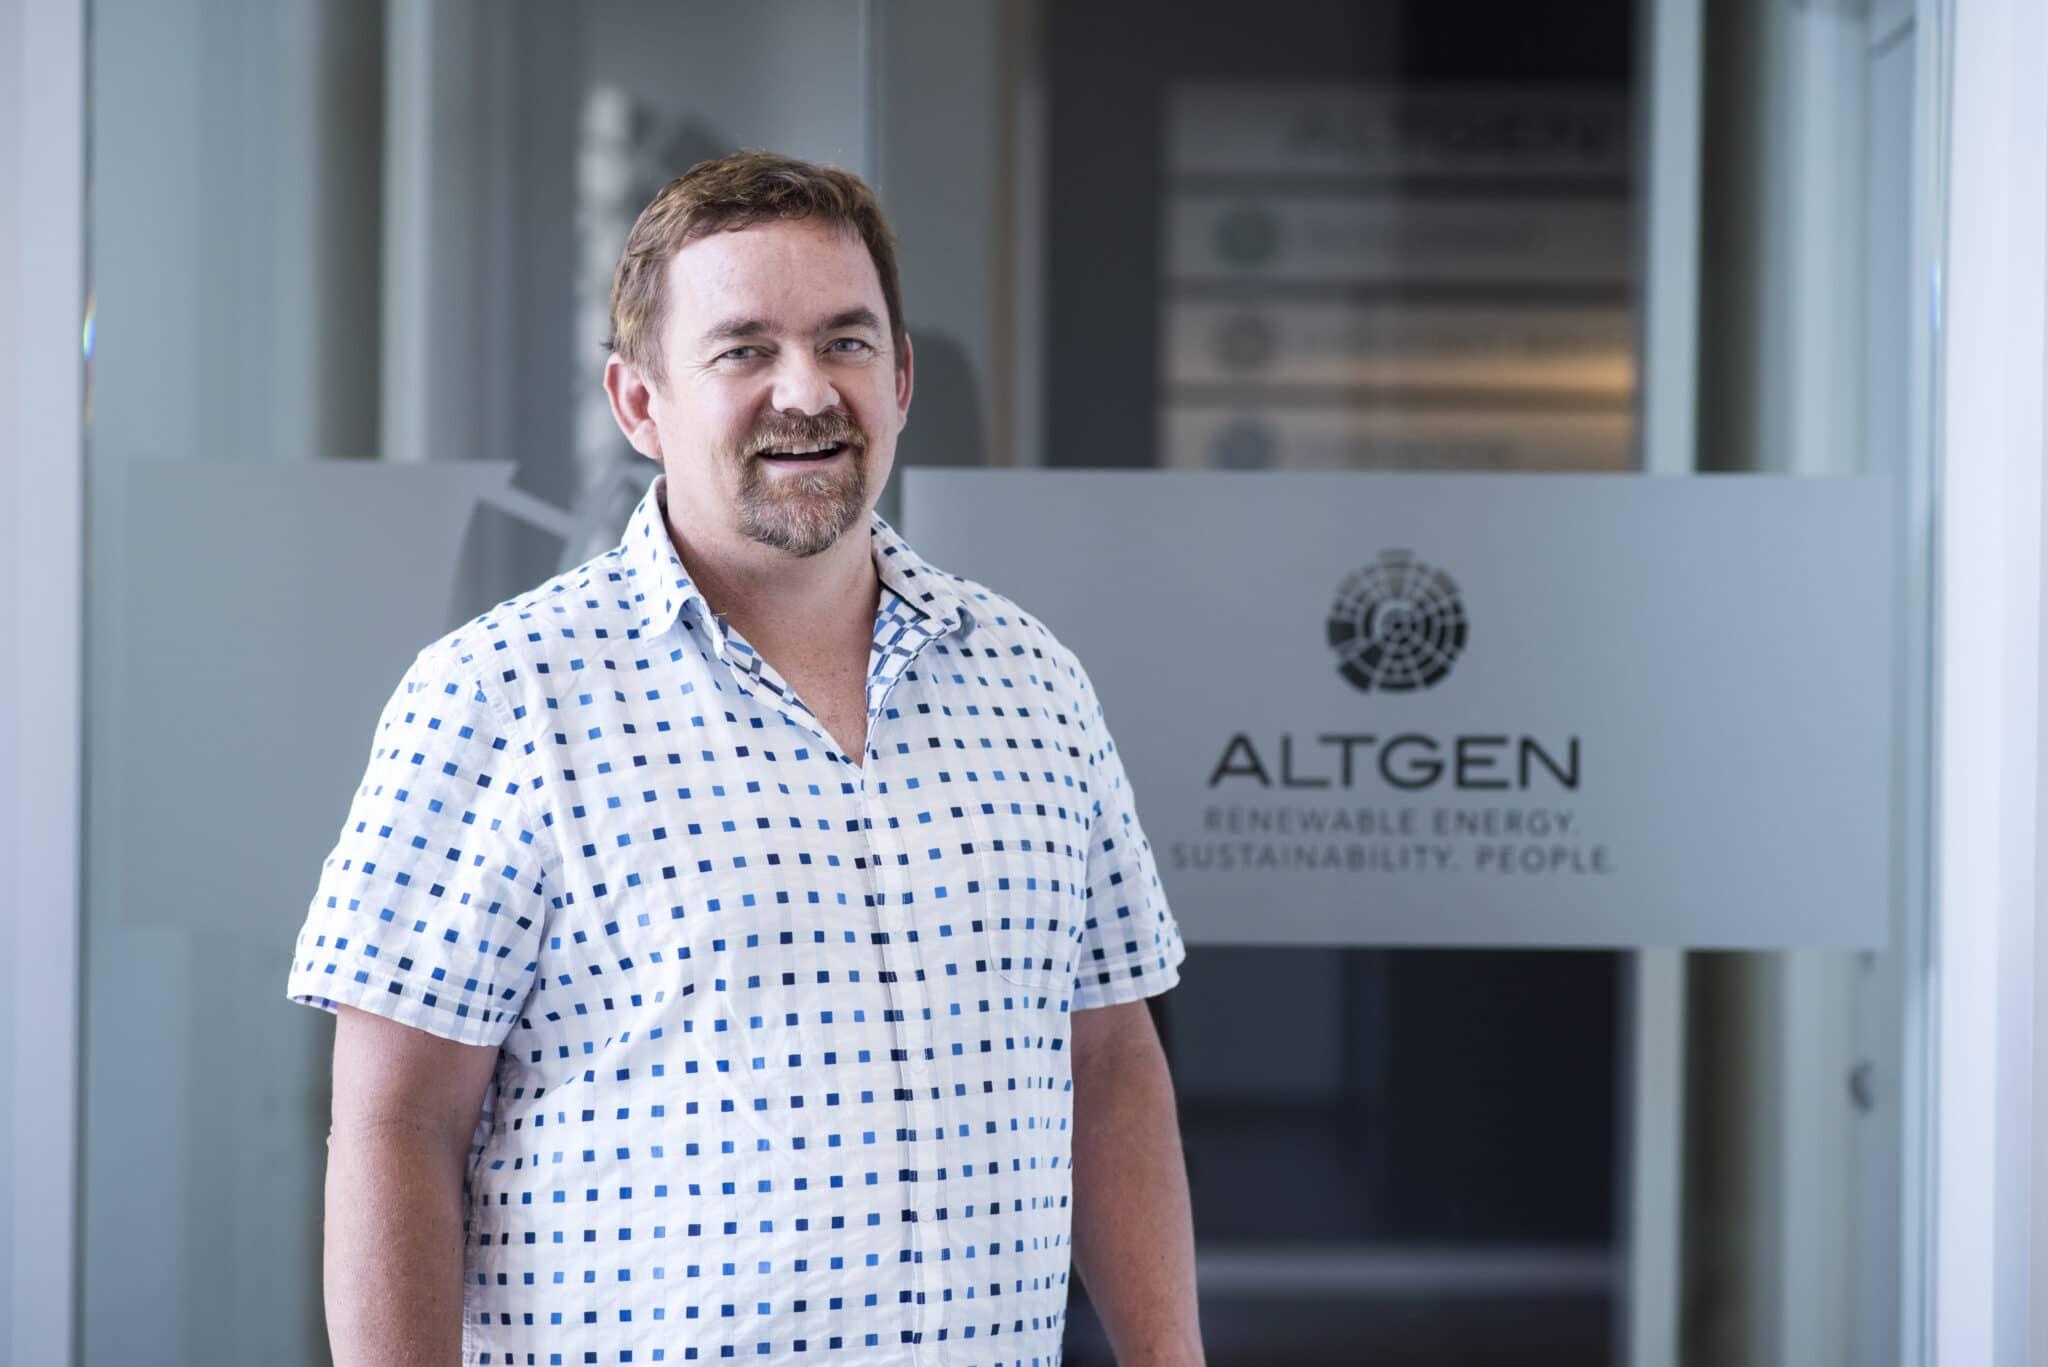 Sean Gibson AltGen